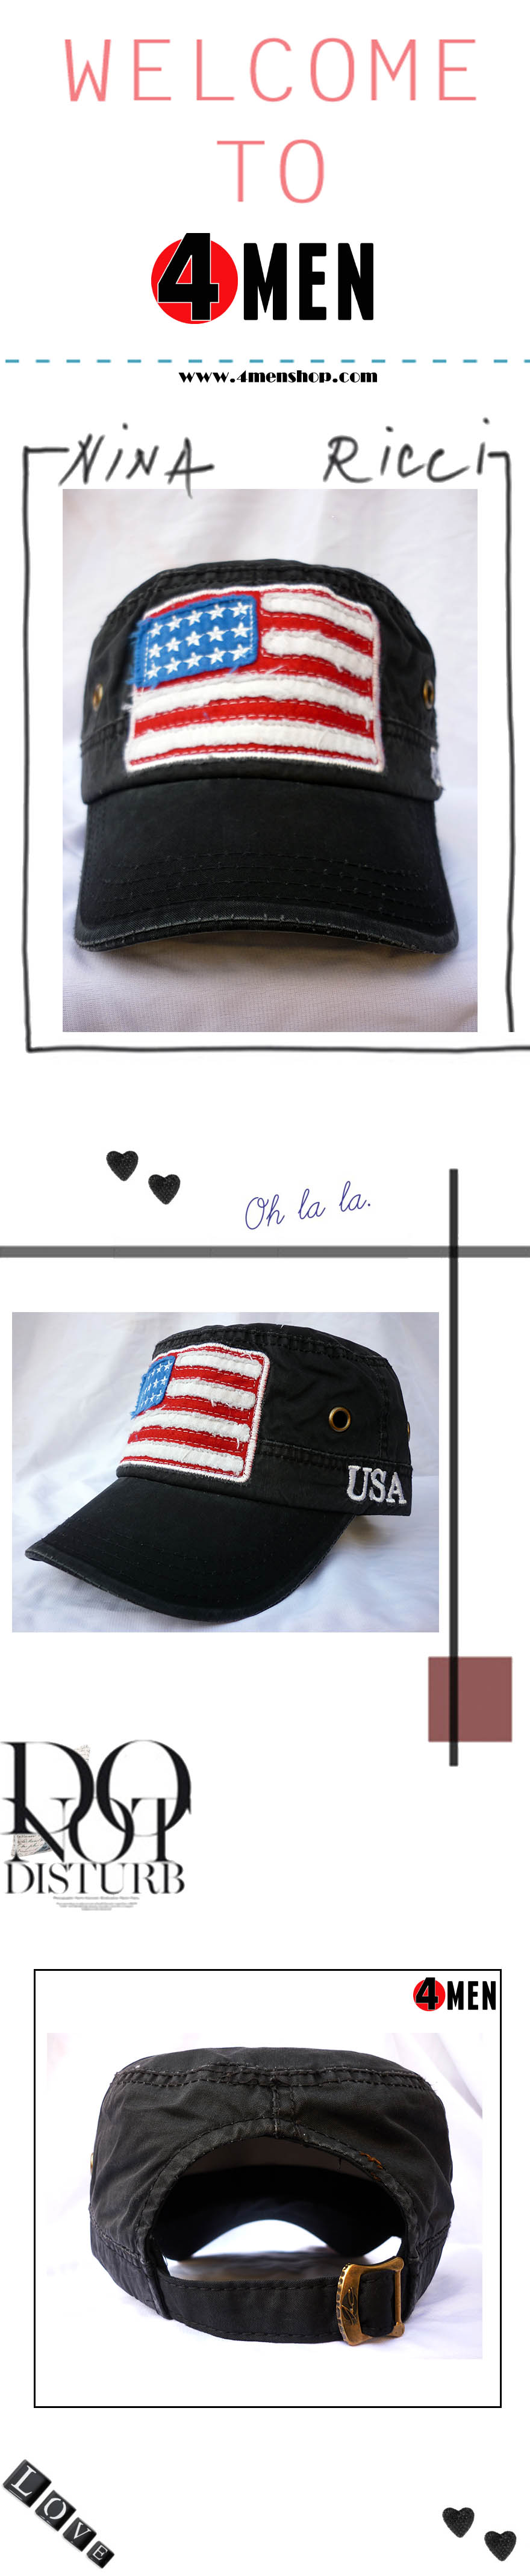 Nón cờ mỹ đen nf037 - 1